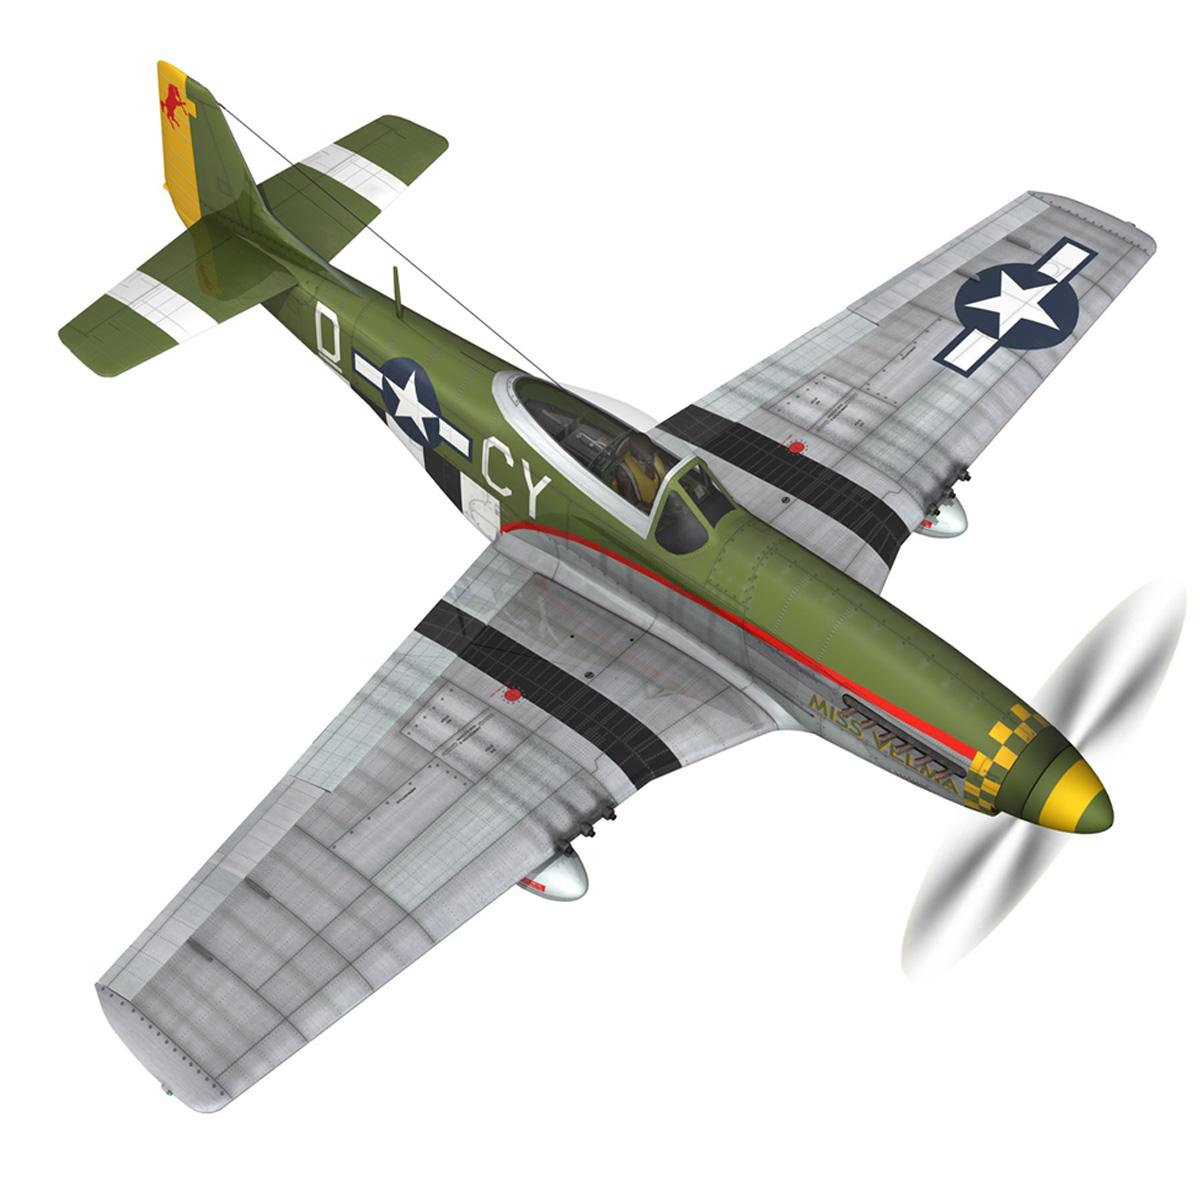 north american p-51d – mustang – miss velma 3d model 3ds fbx c4d lwo obj 267625